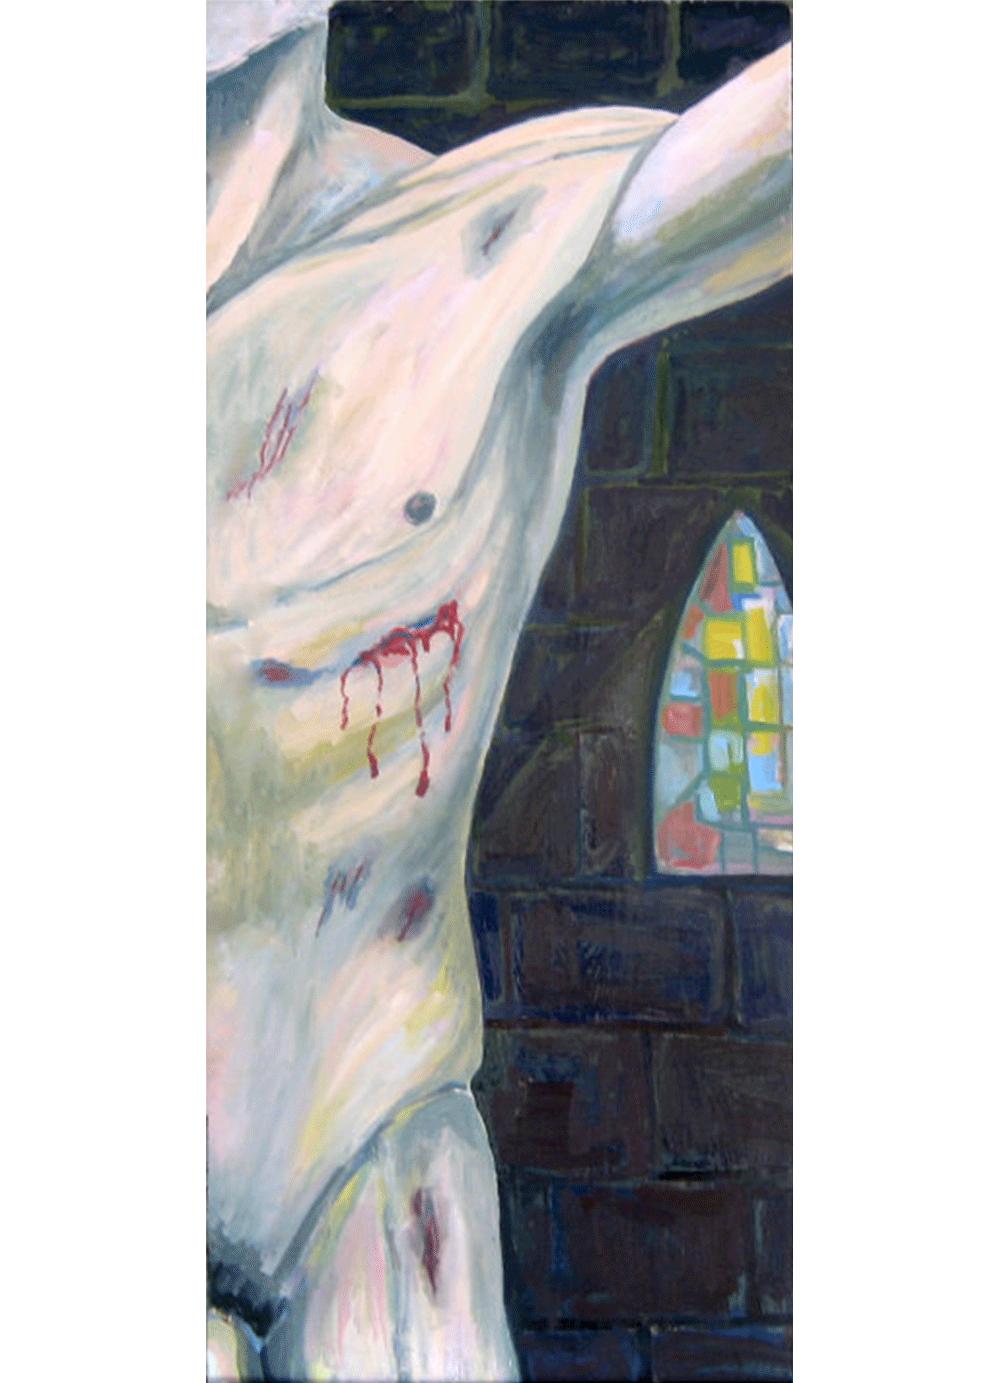 Pintura-Cruxificcion-RD.Escultor